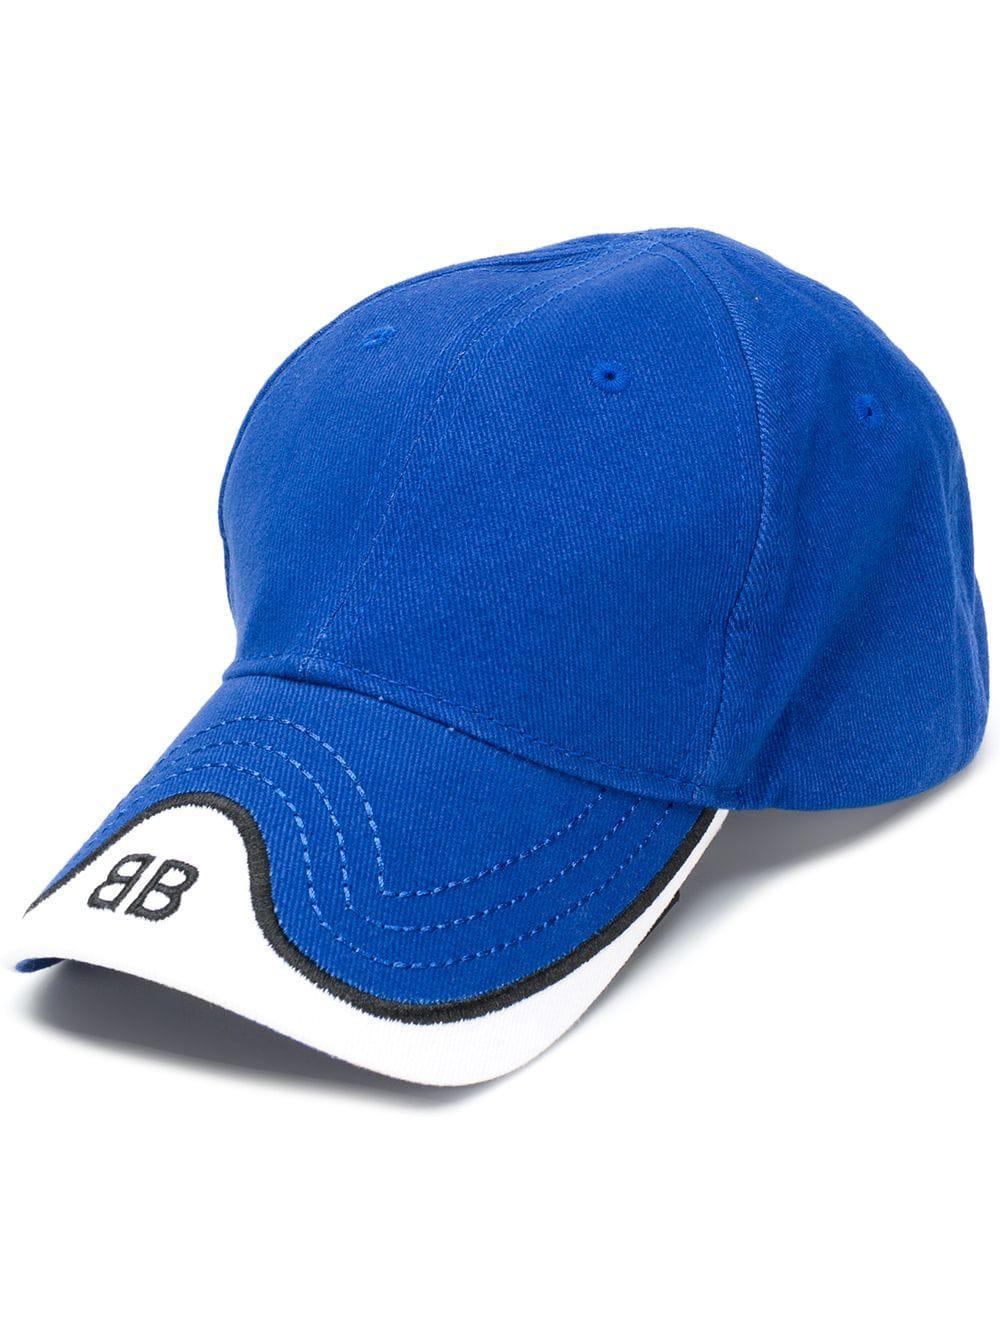 85d2a851f86 Balenciaga Cotton Hat in Blue for Men - Lyst